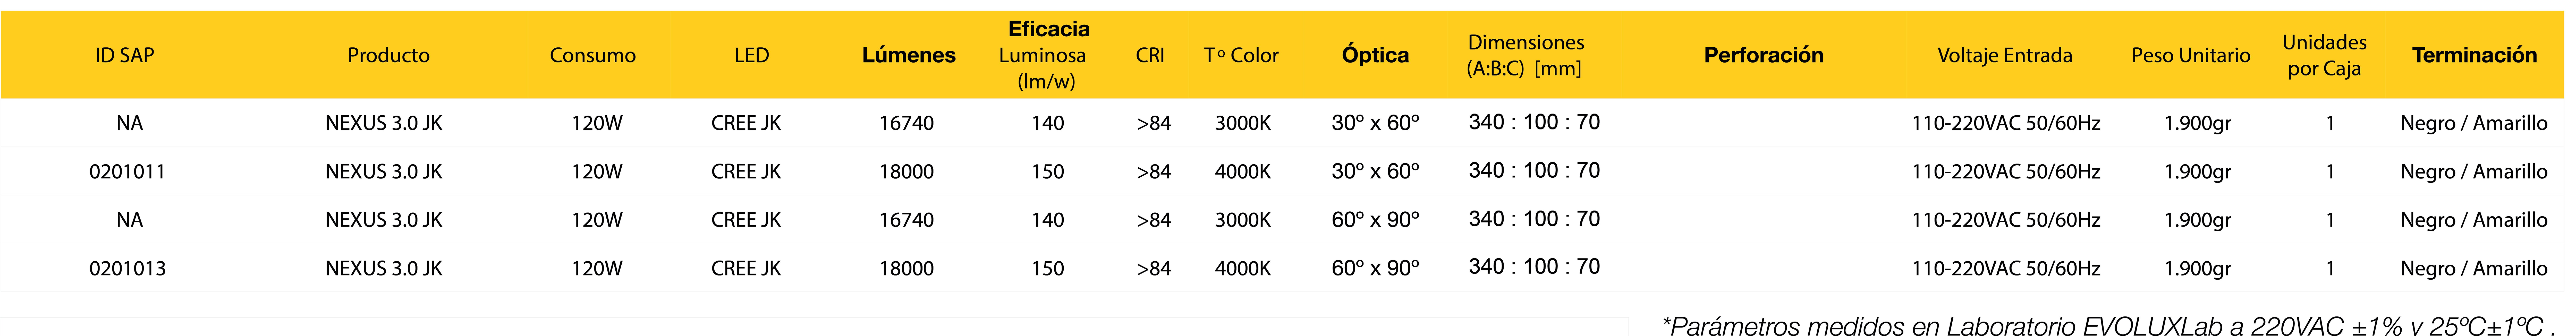 tabla caracteristicas nexus 120 evolux